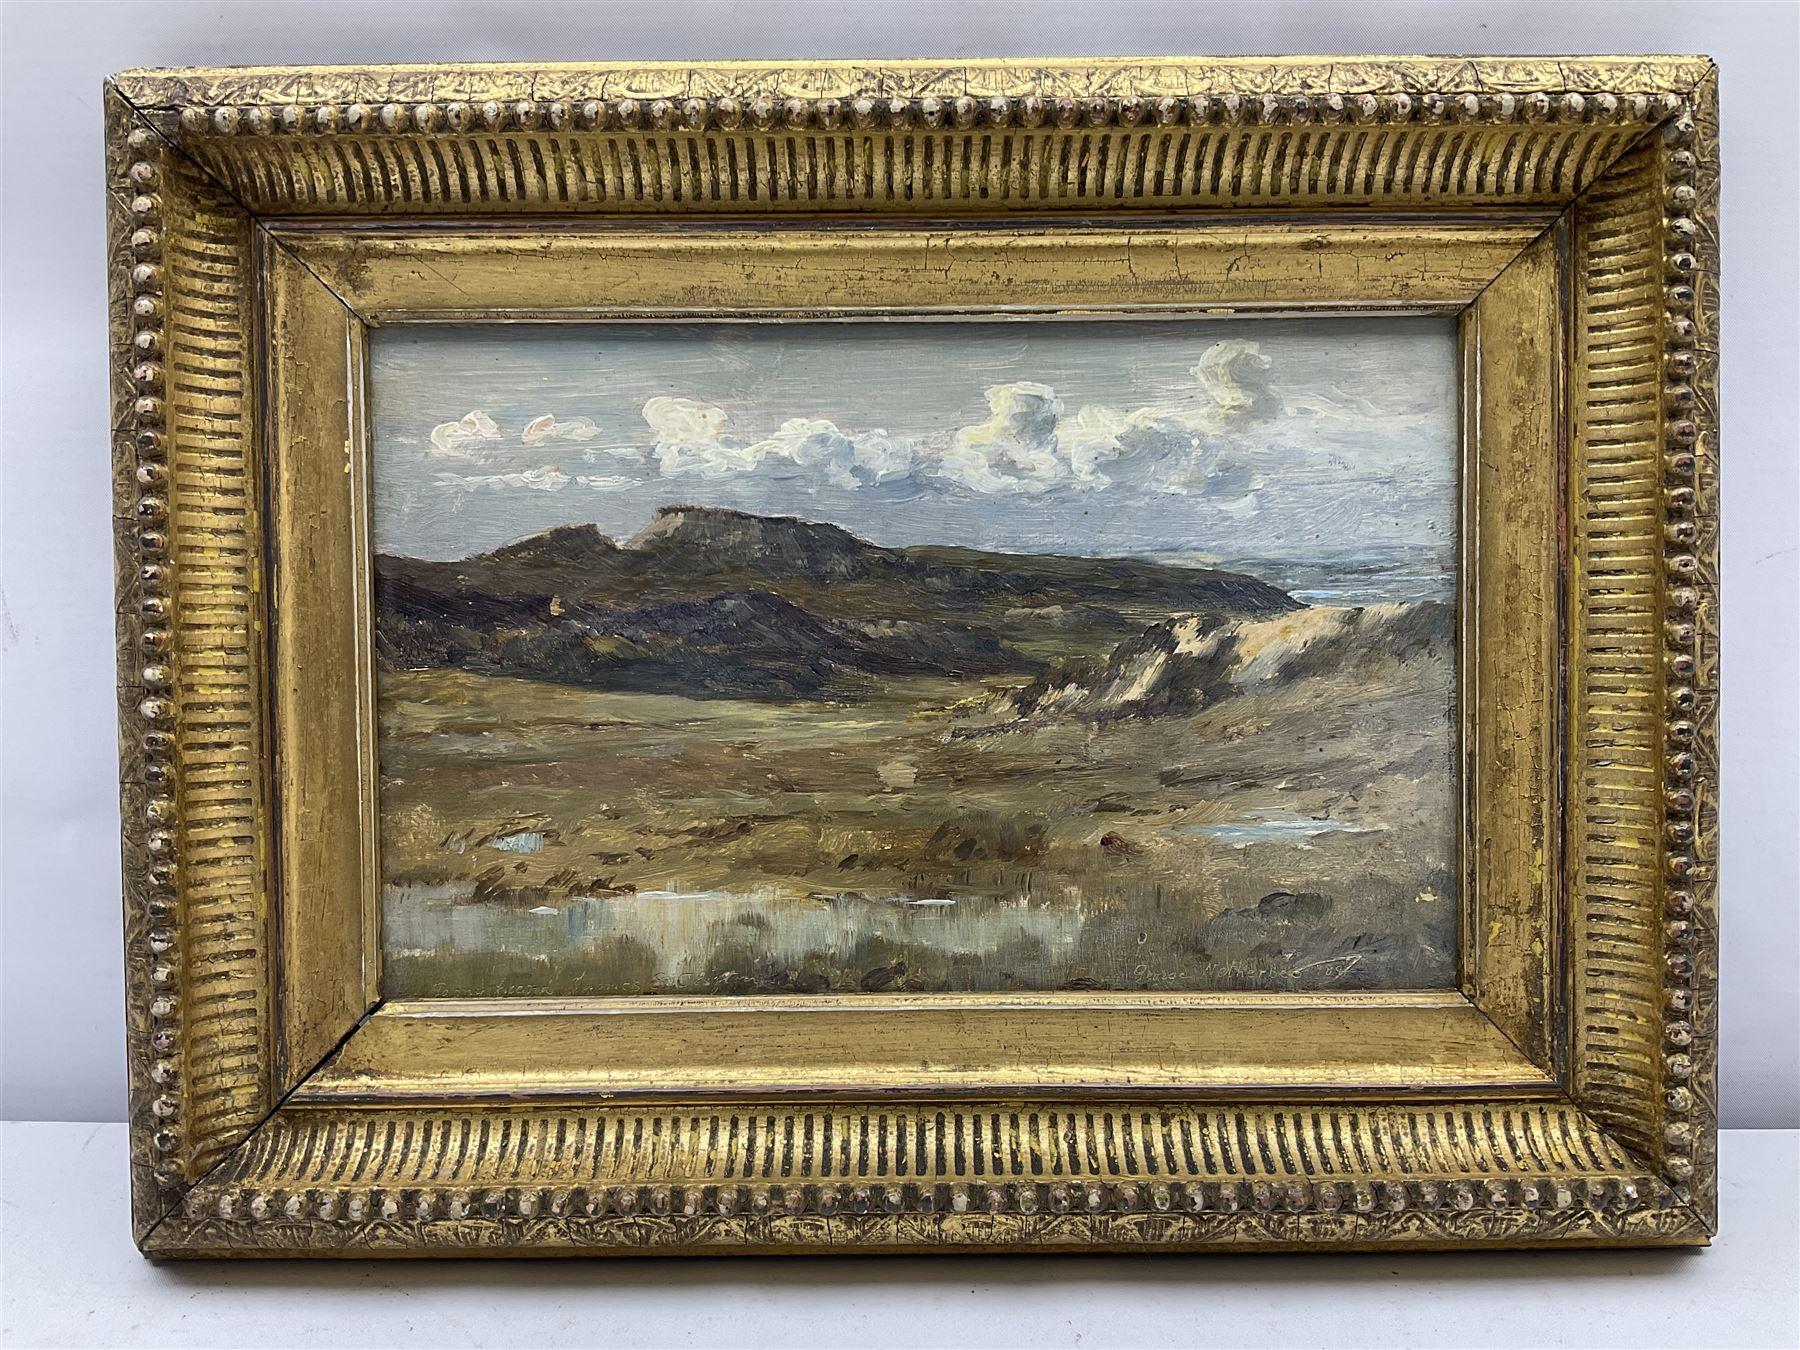 George Faulkner Wetherbee RI ROI (American 1851-1920): Upland Landscape - Image 2 of 5